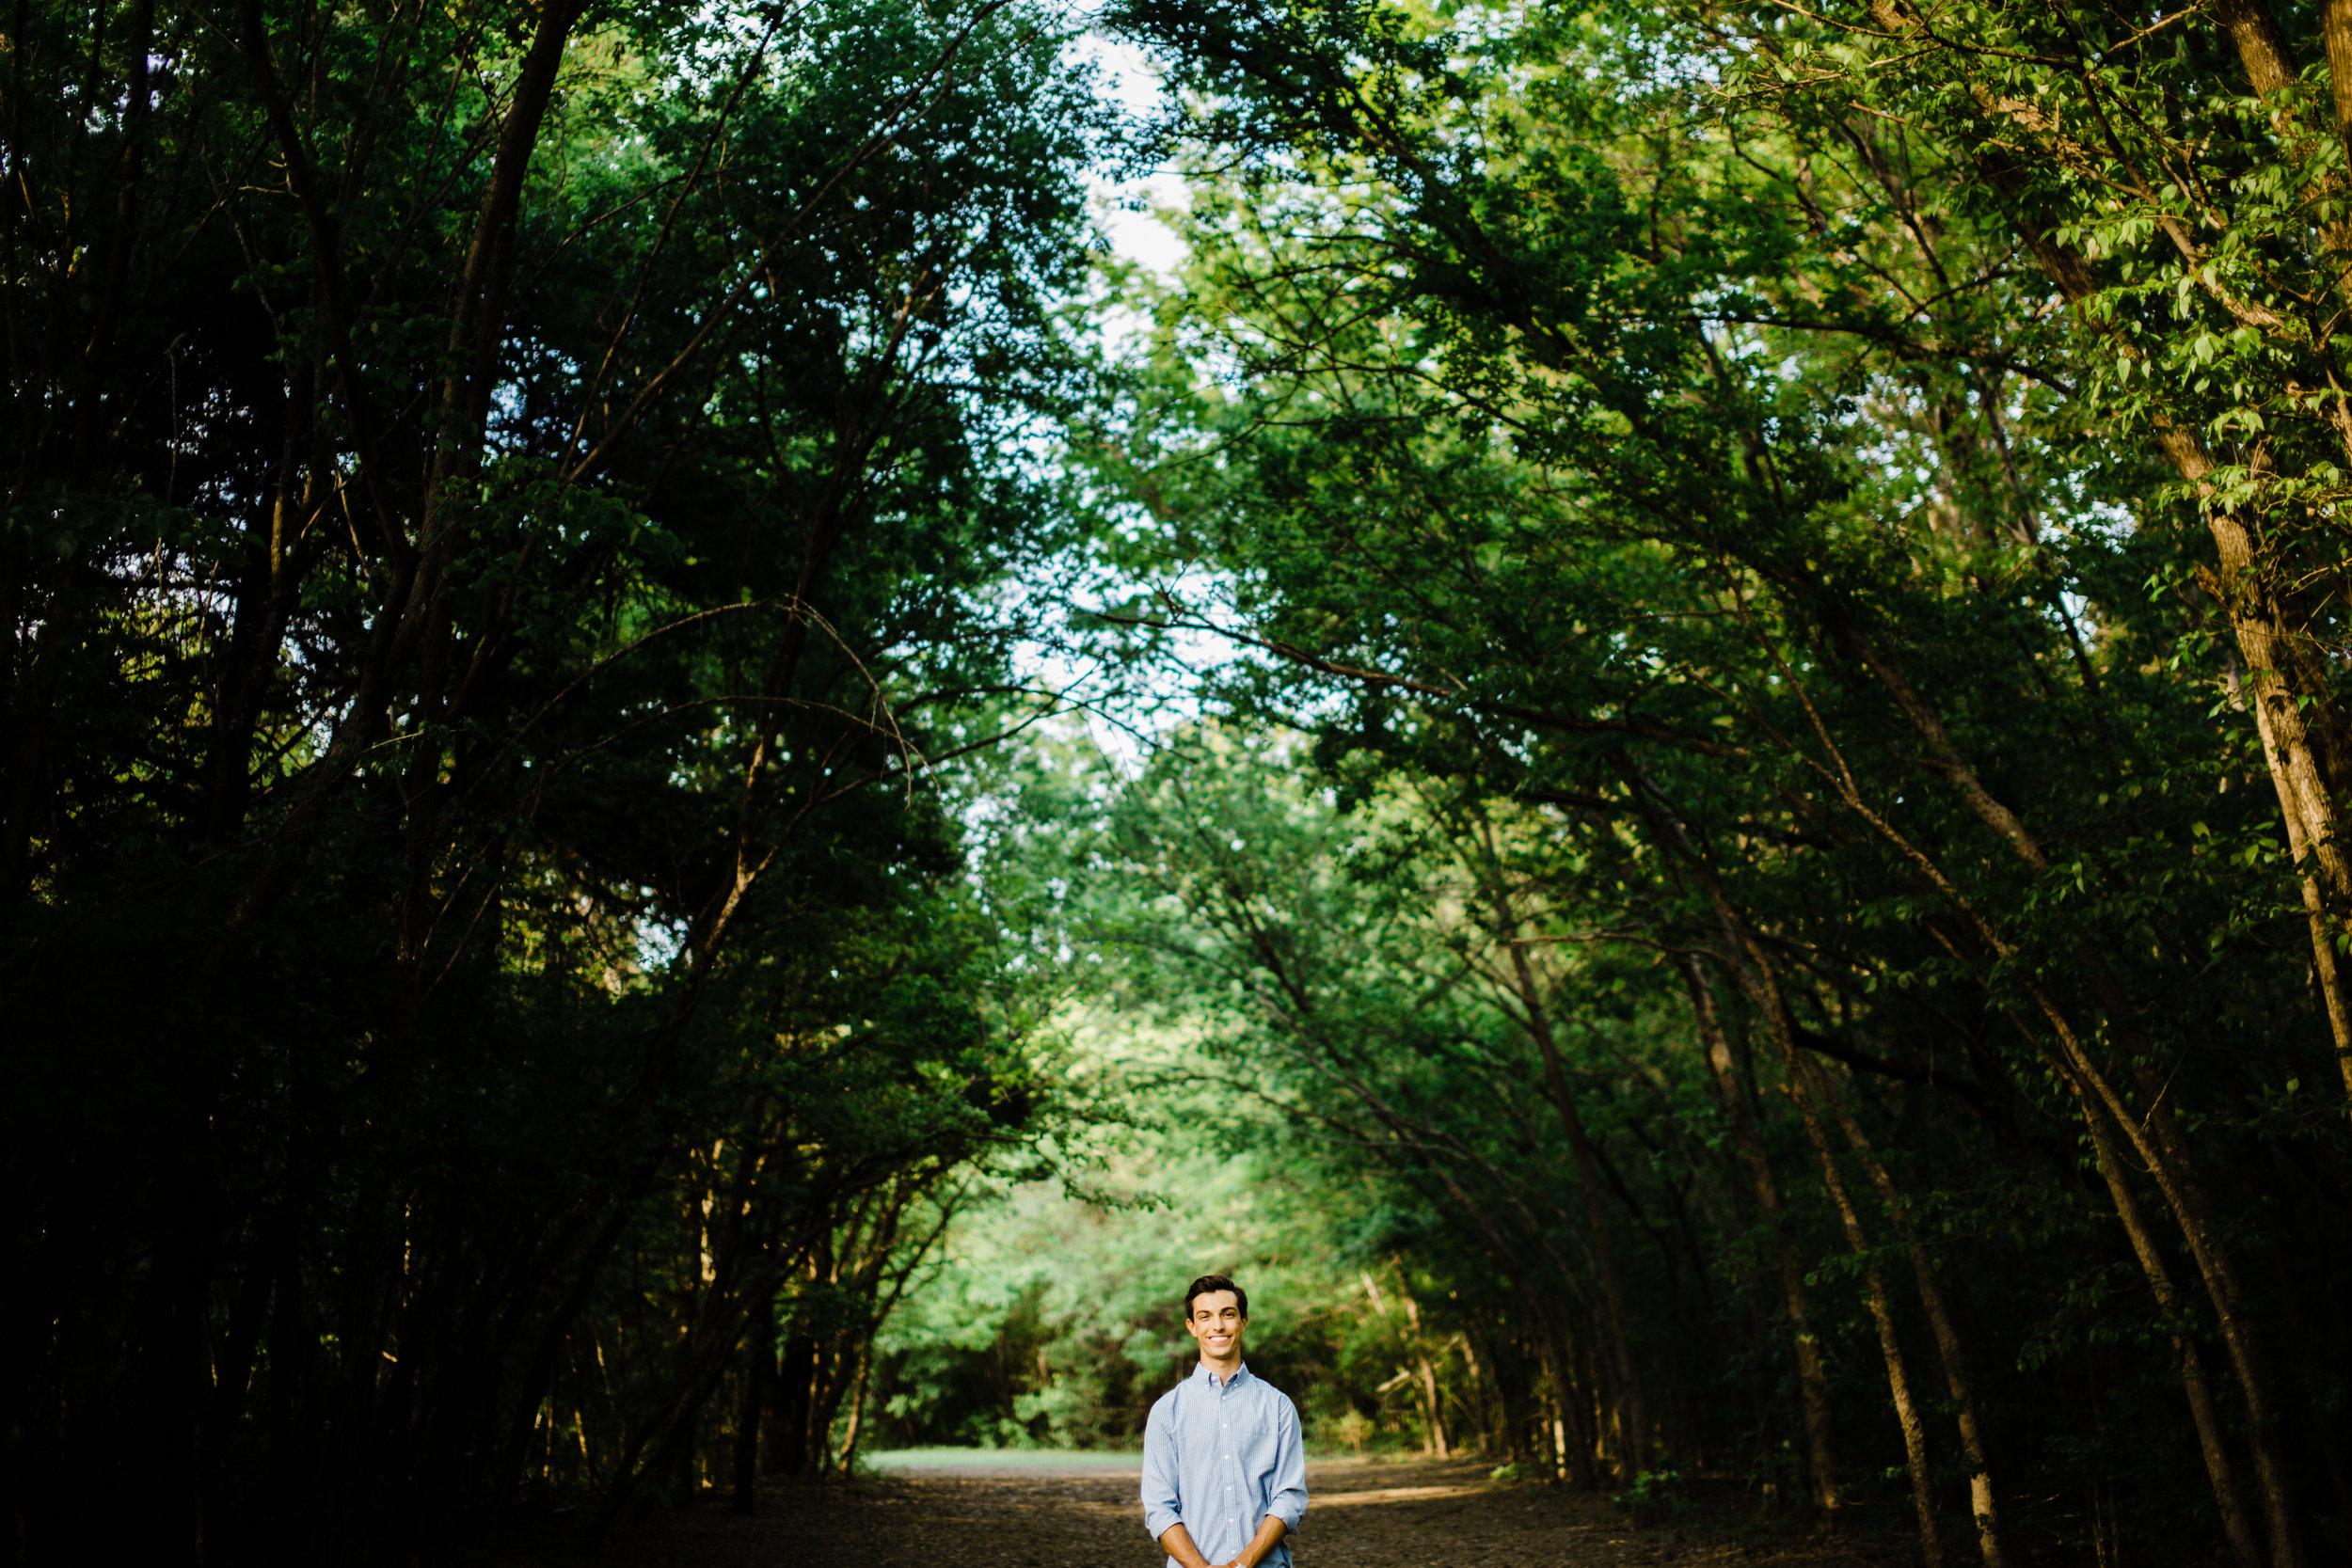 Mason_Senior_Photoshoot-48.jpg